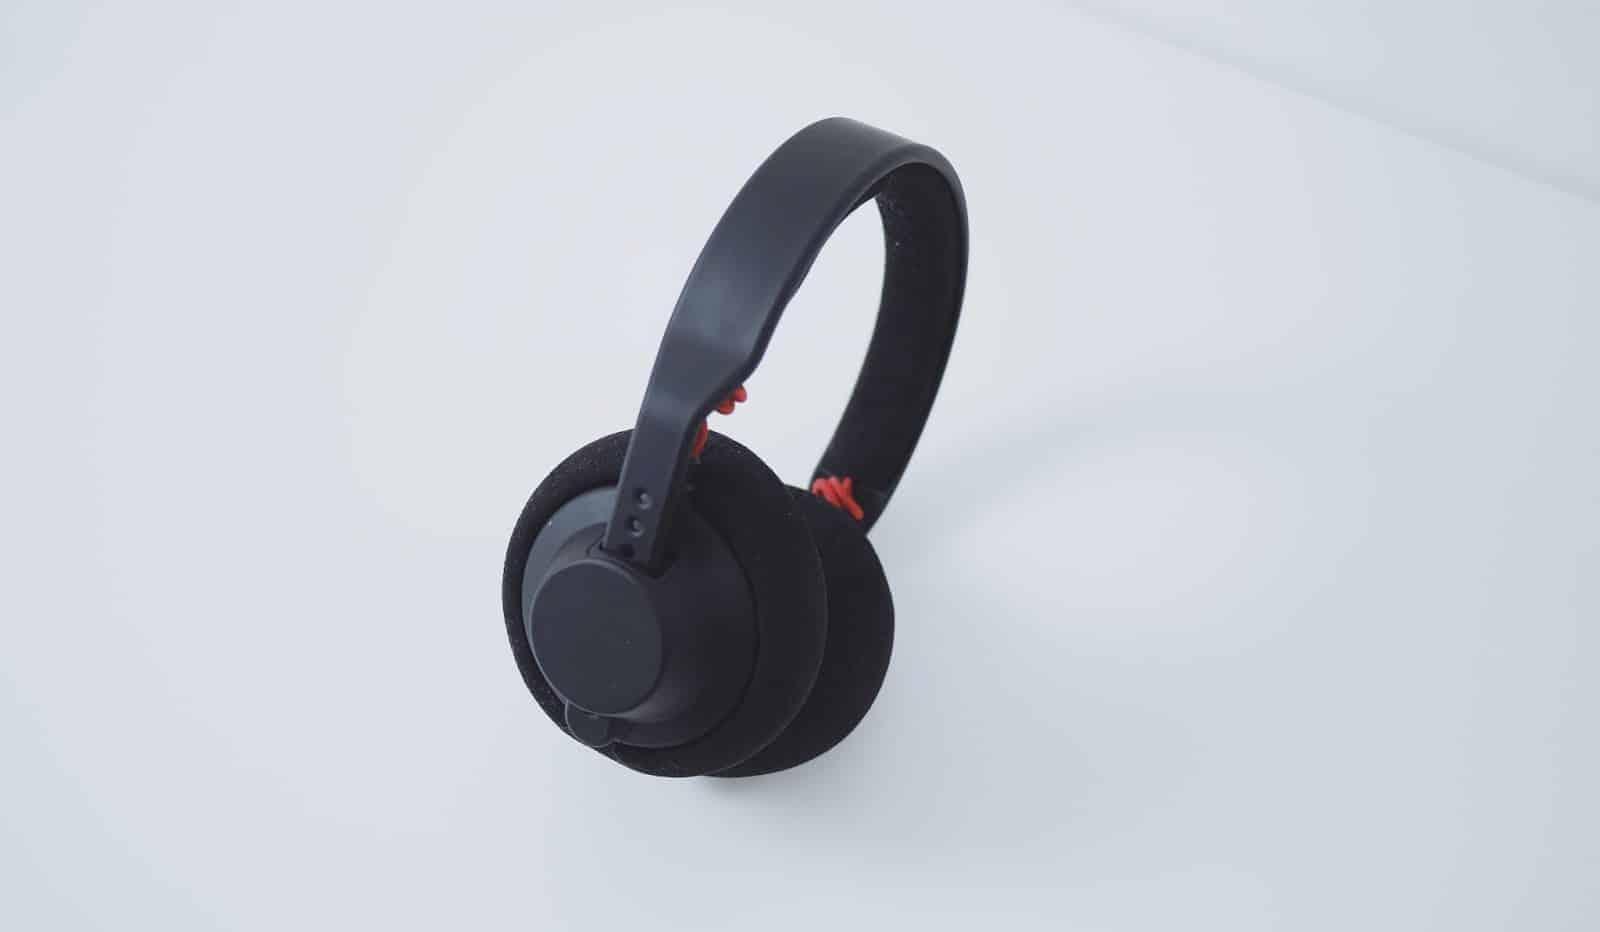 Best Wireless Bluetooth headphones 2017 – Top 10 List